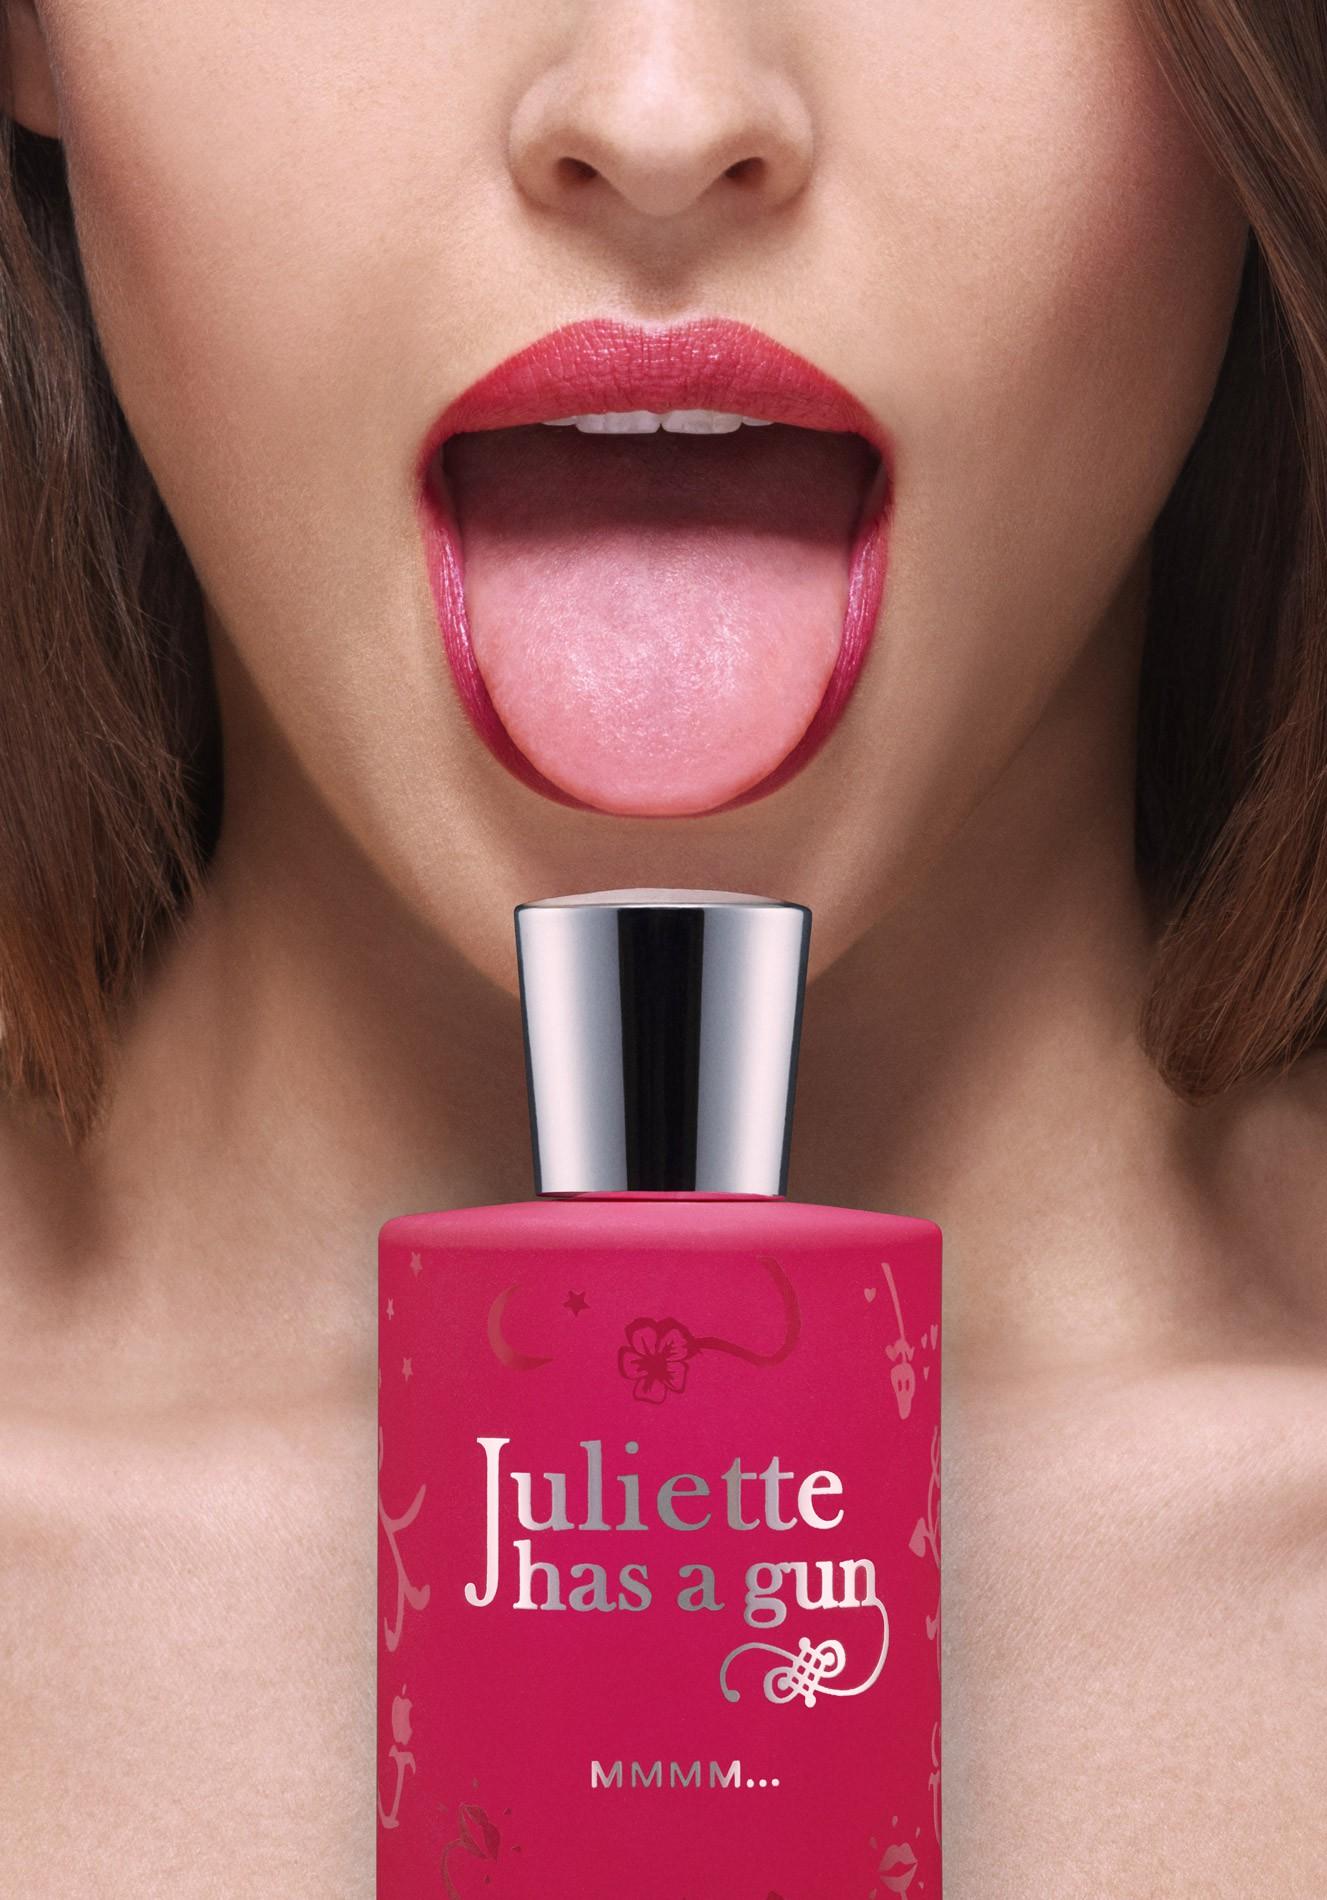 New Year, New You: MMMM… by Juliette Has A Gun